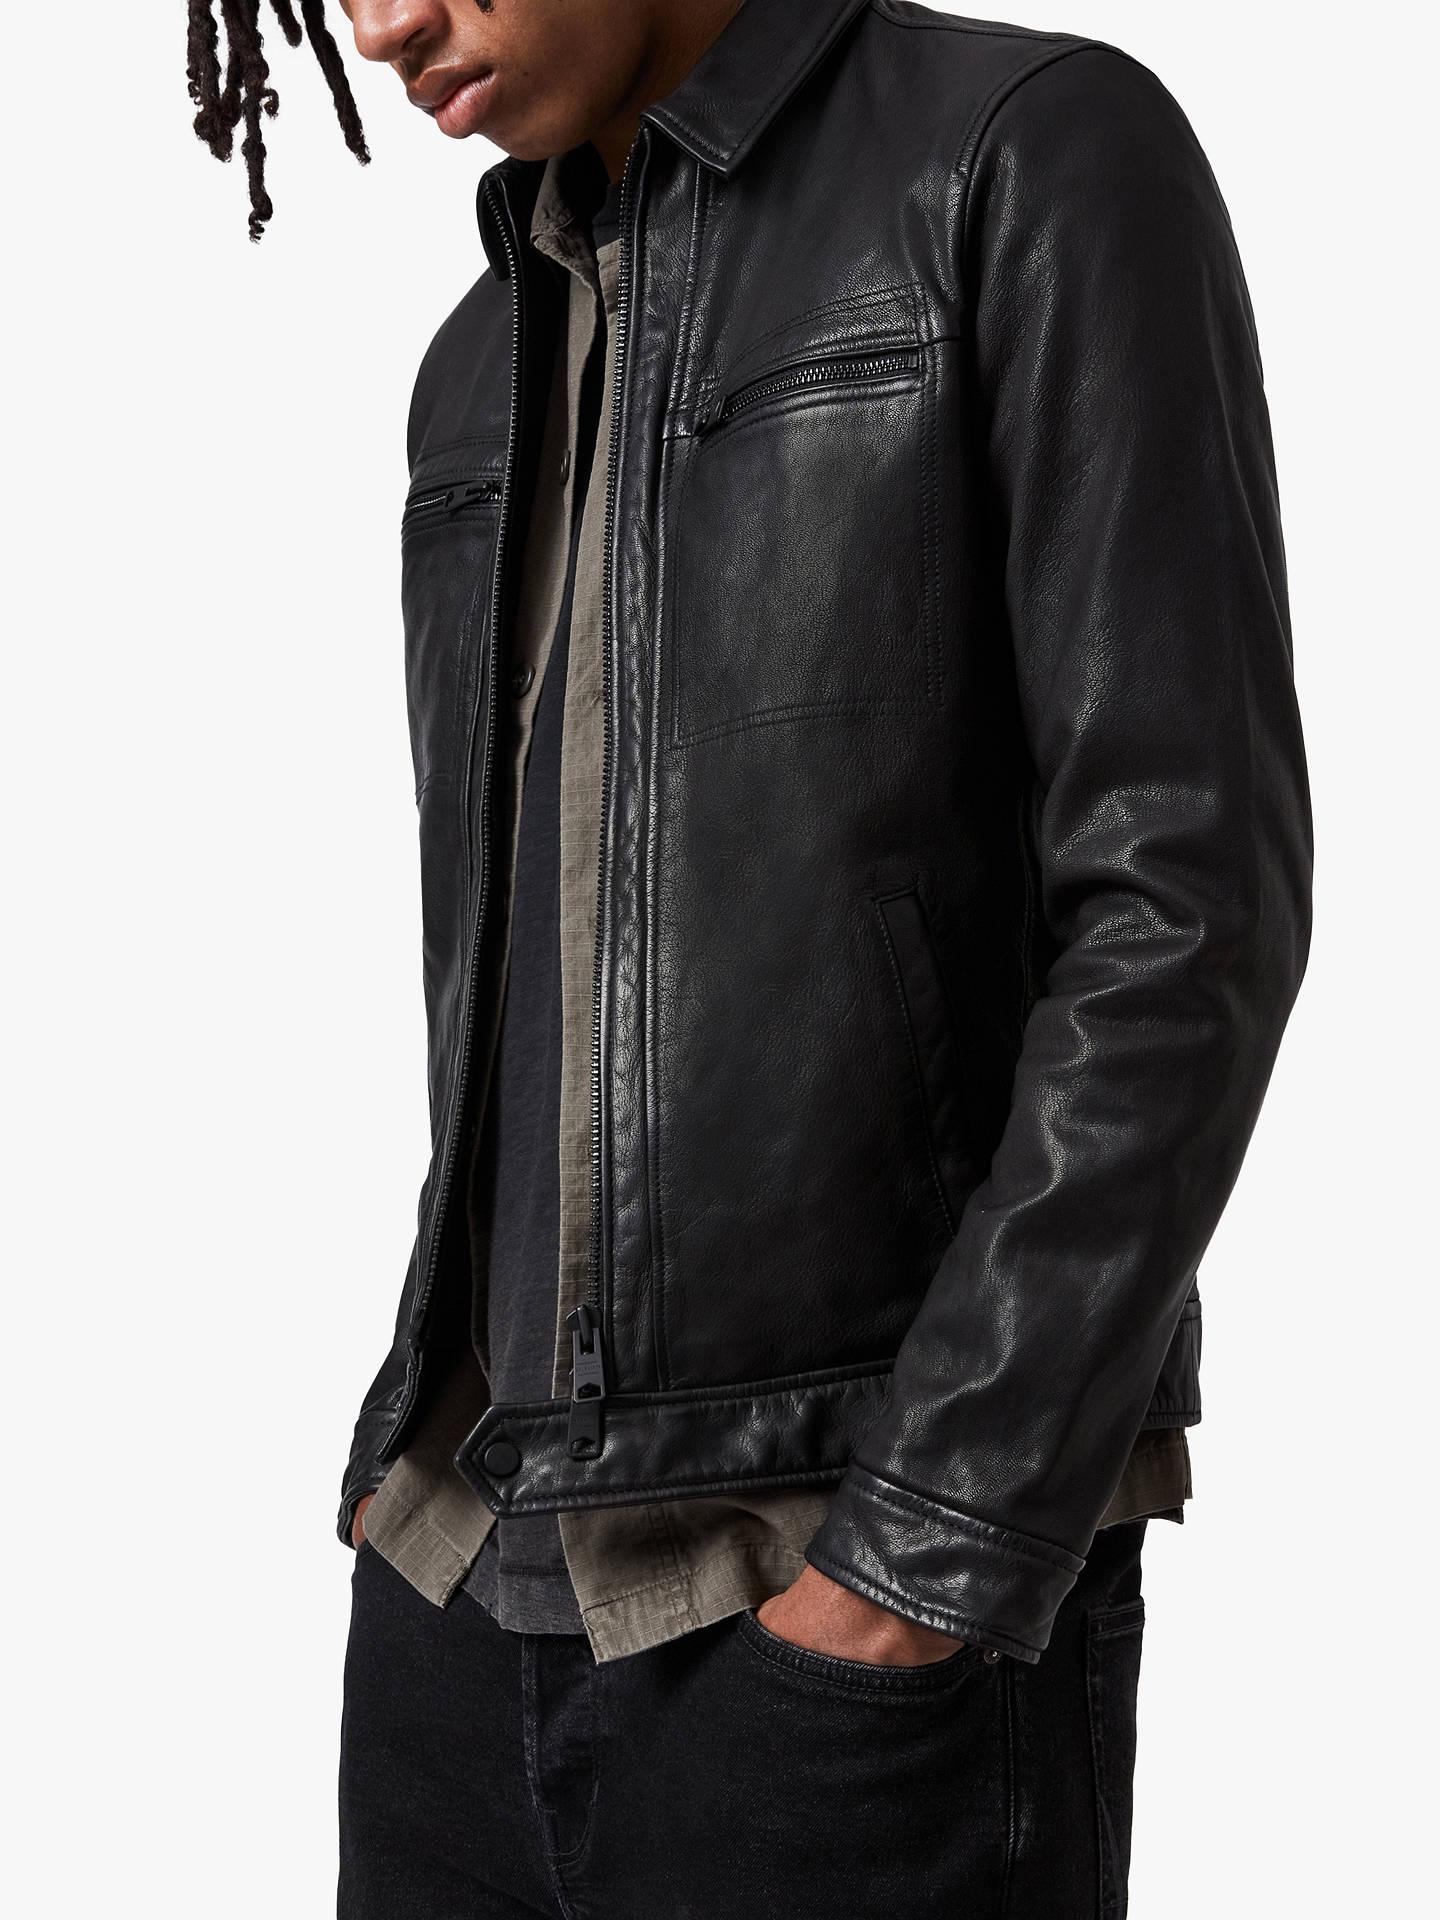 c376736e2ff3 ... Buy AllSaints Lark Leather Jacket